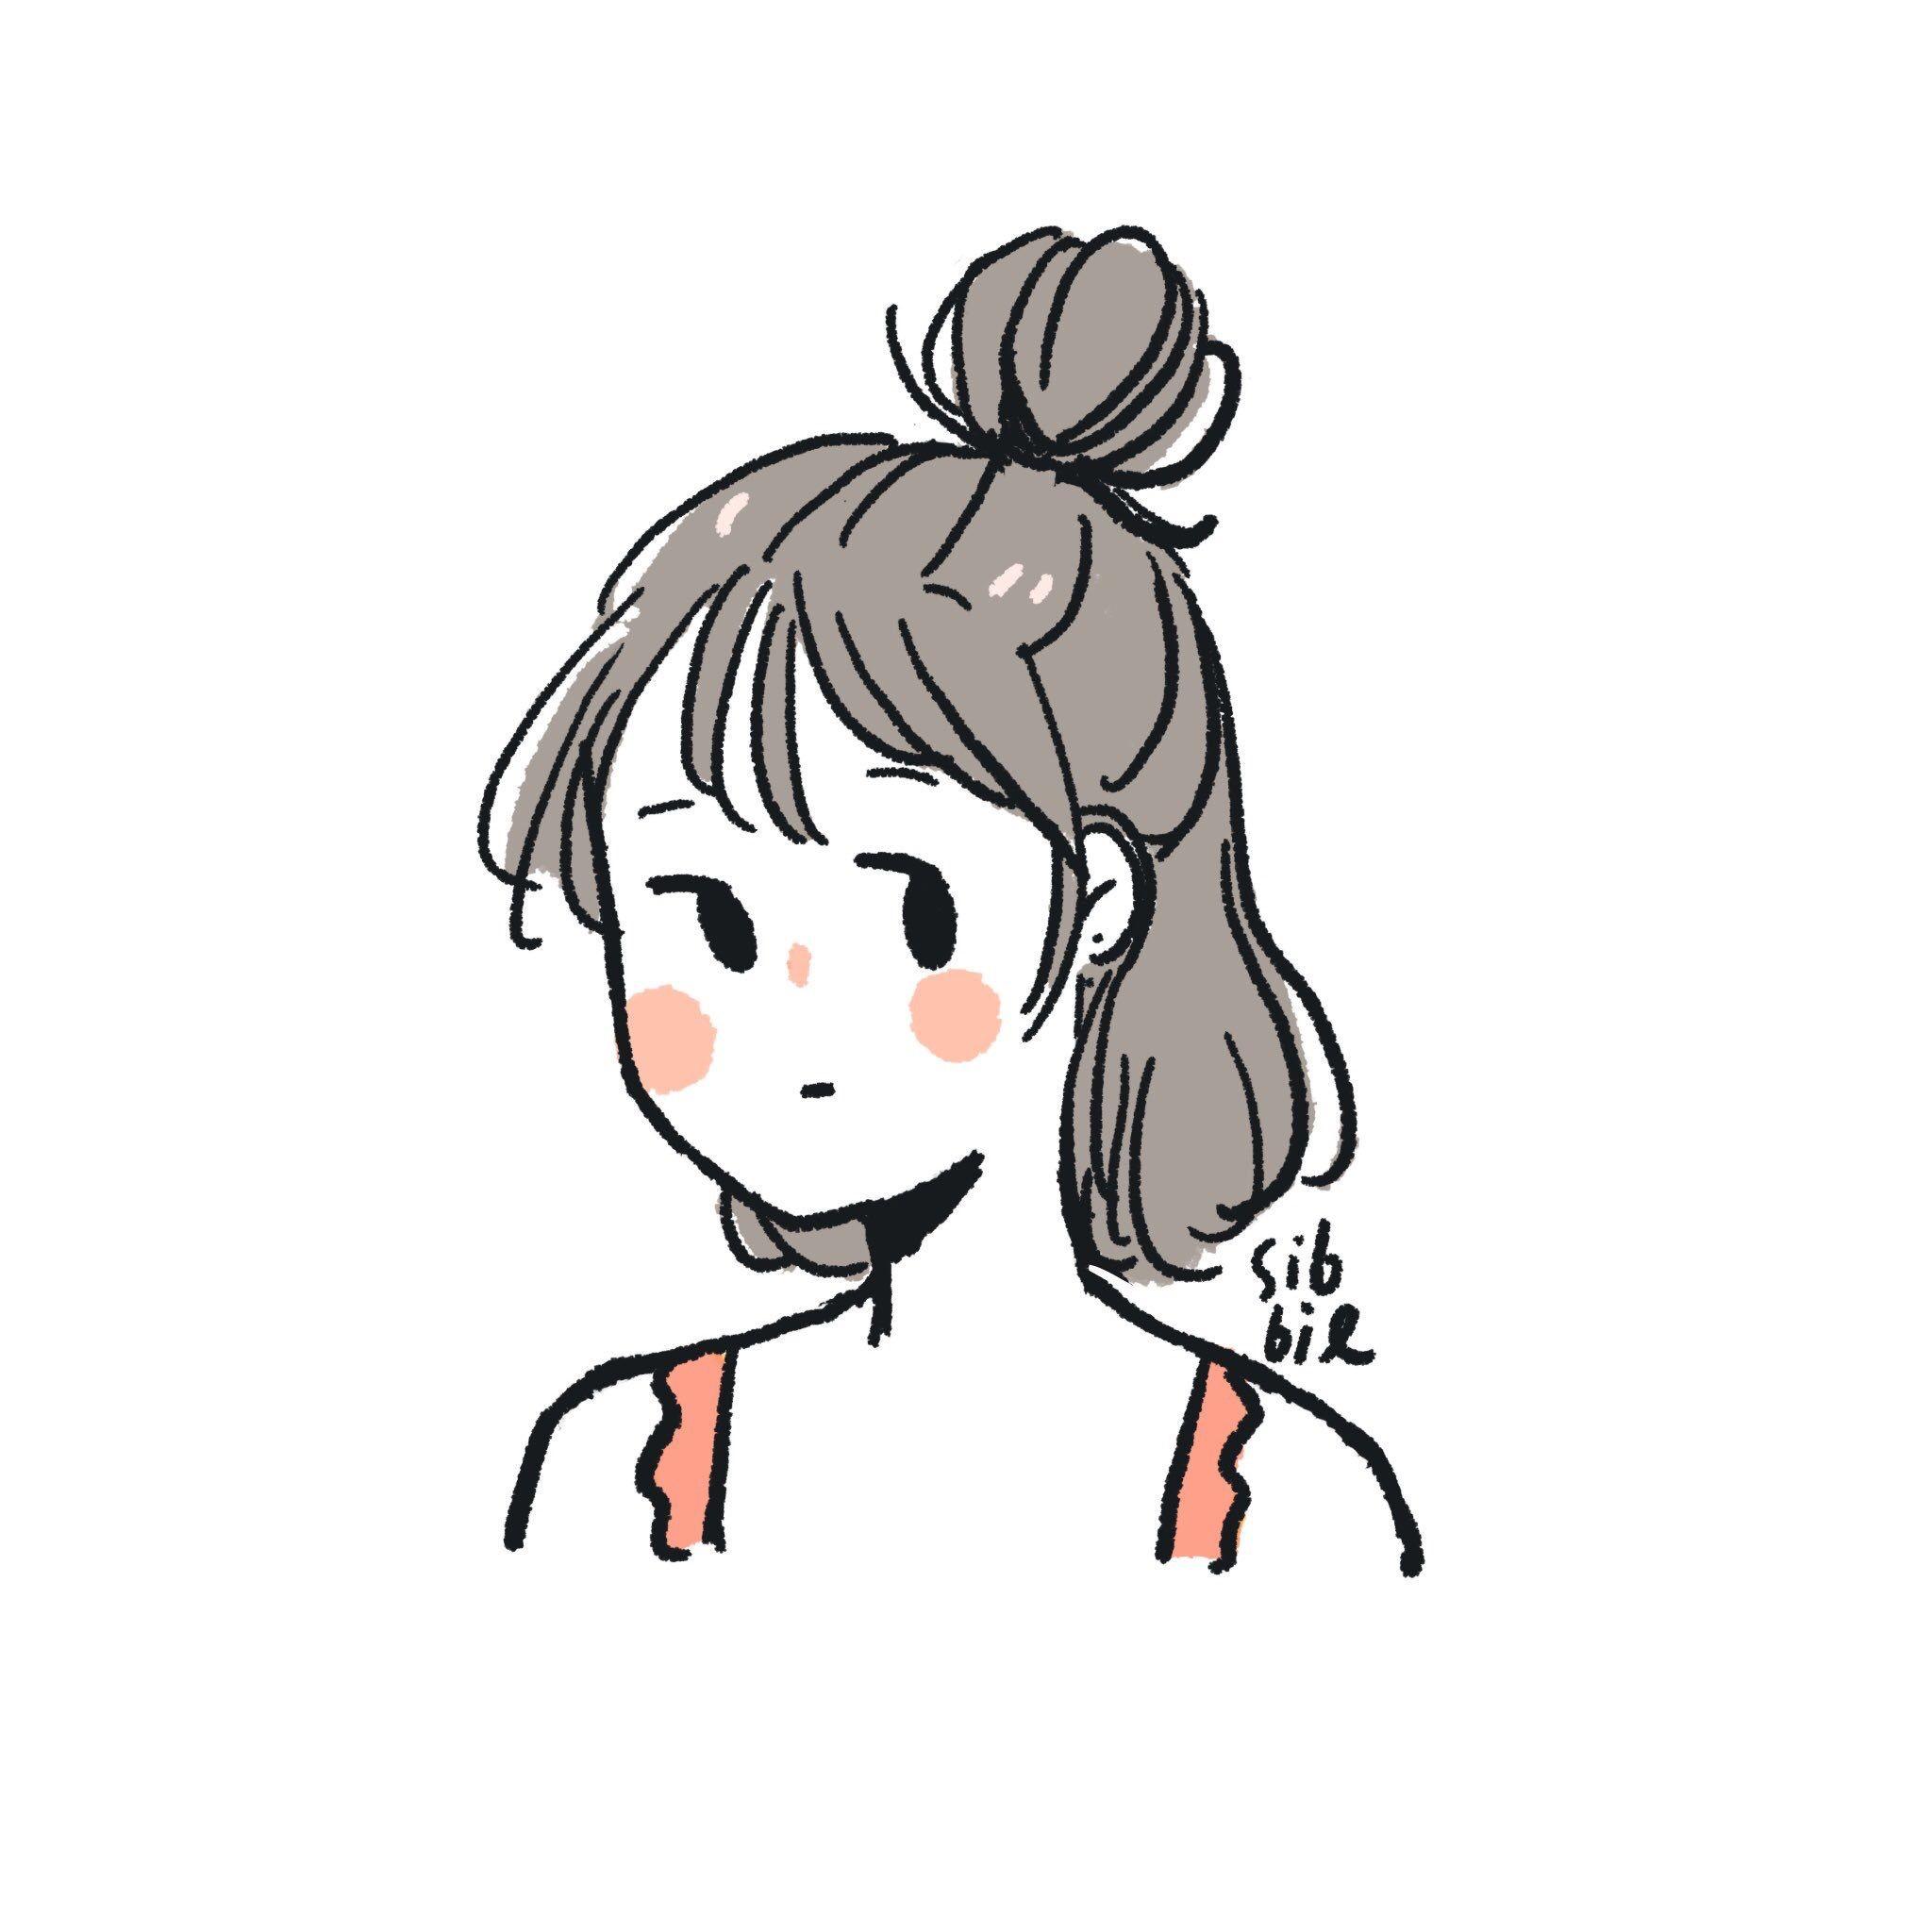 Pin Oleh Nplengg Di Random Aesthetic Ilustrasi Karakter Ilustrasi Komik Ilustrator